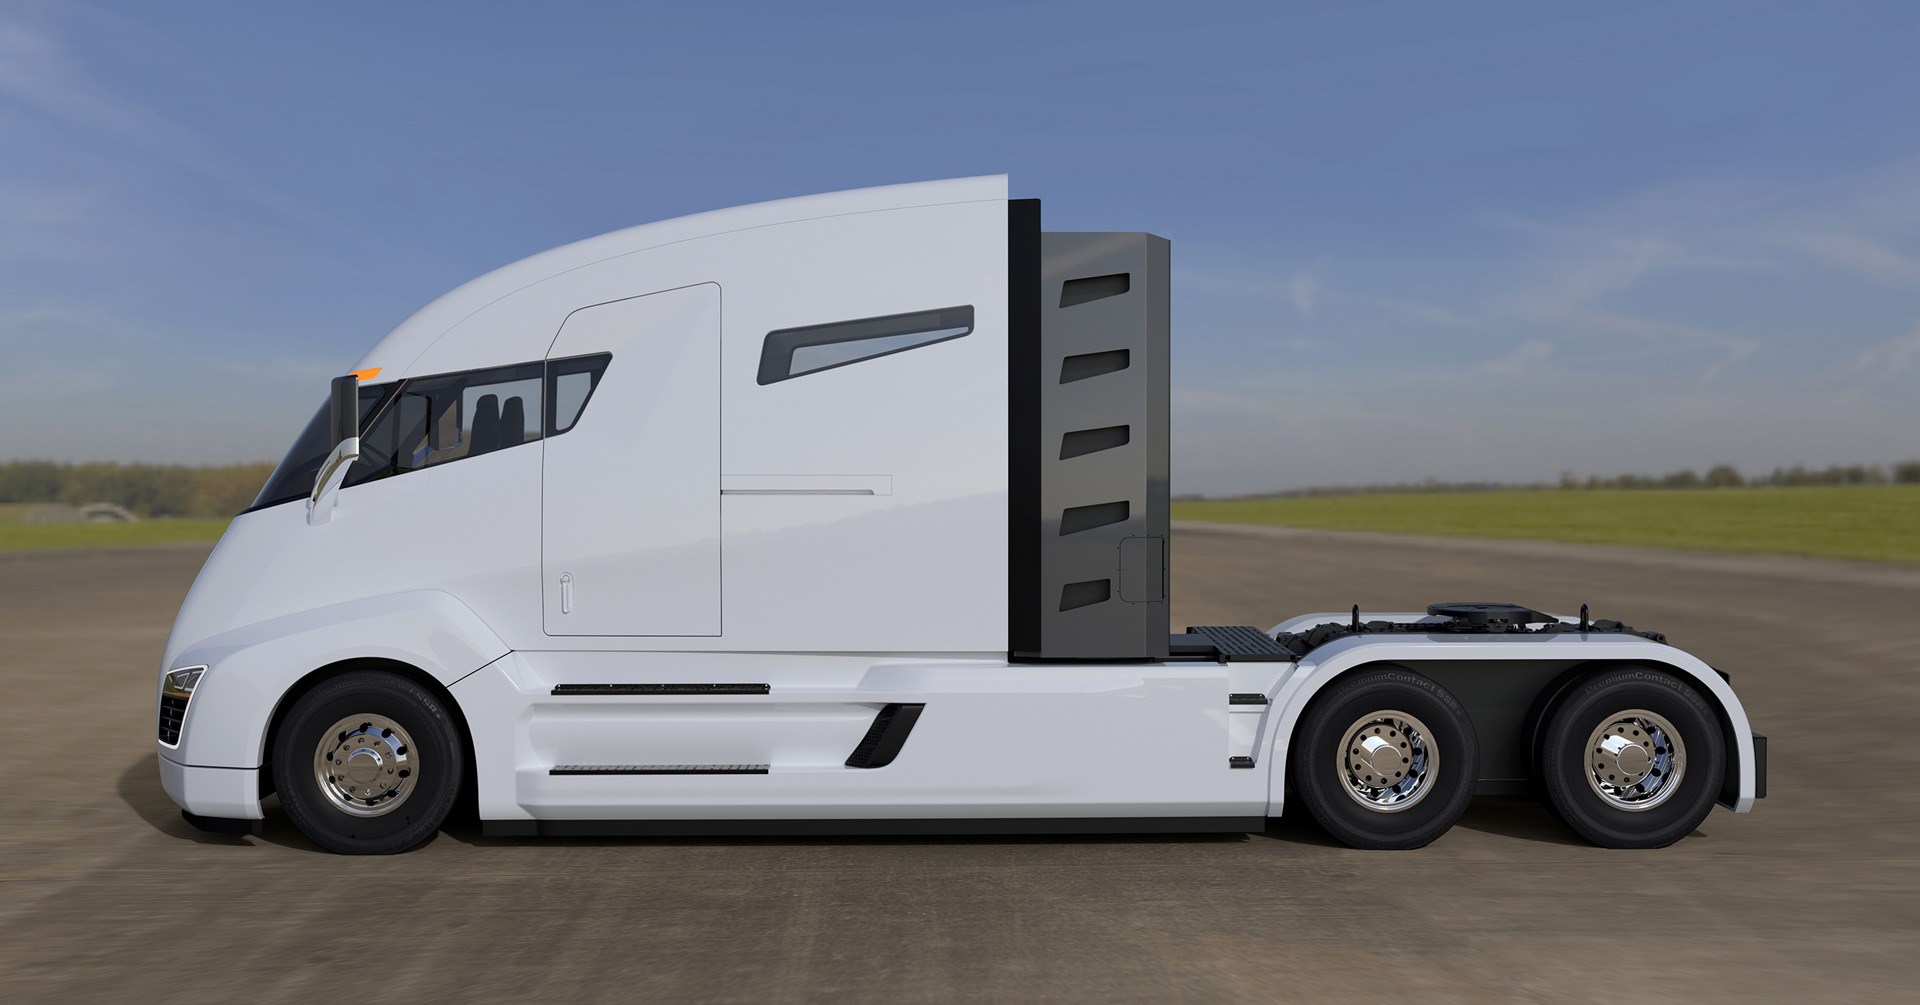 2 000 hp nikola one electric truck racks up thousands of